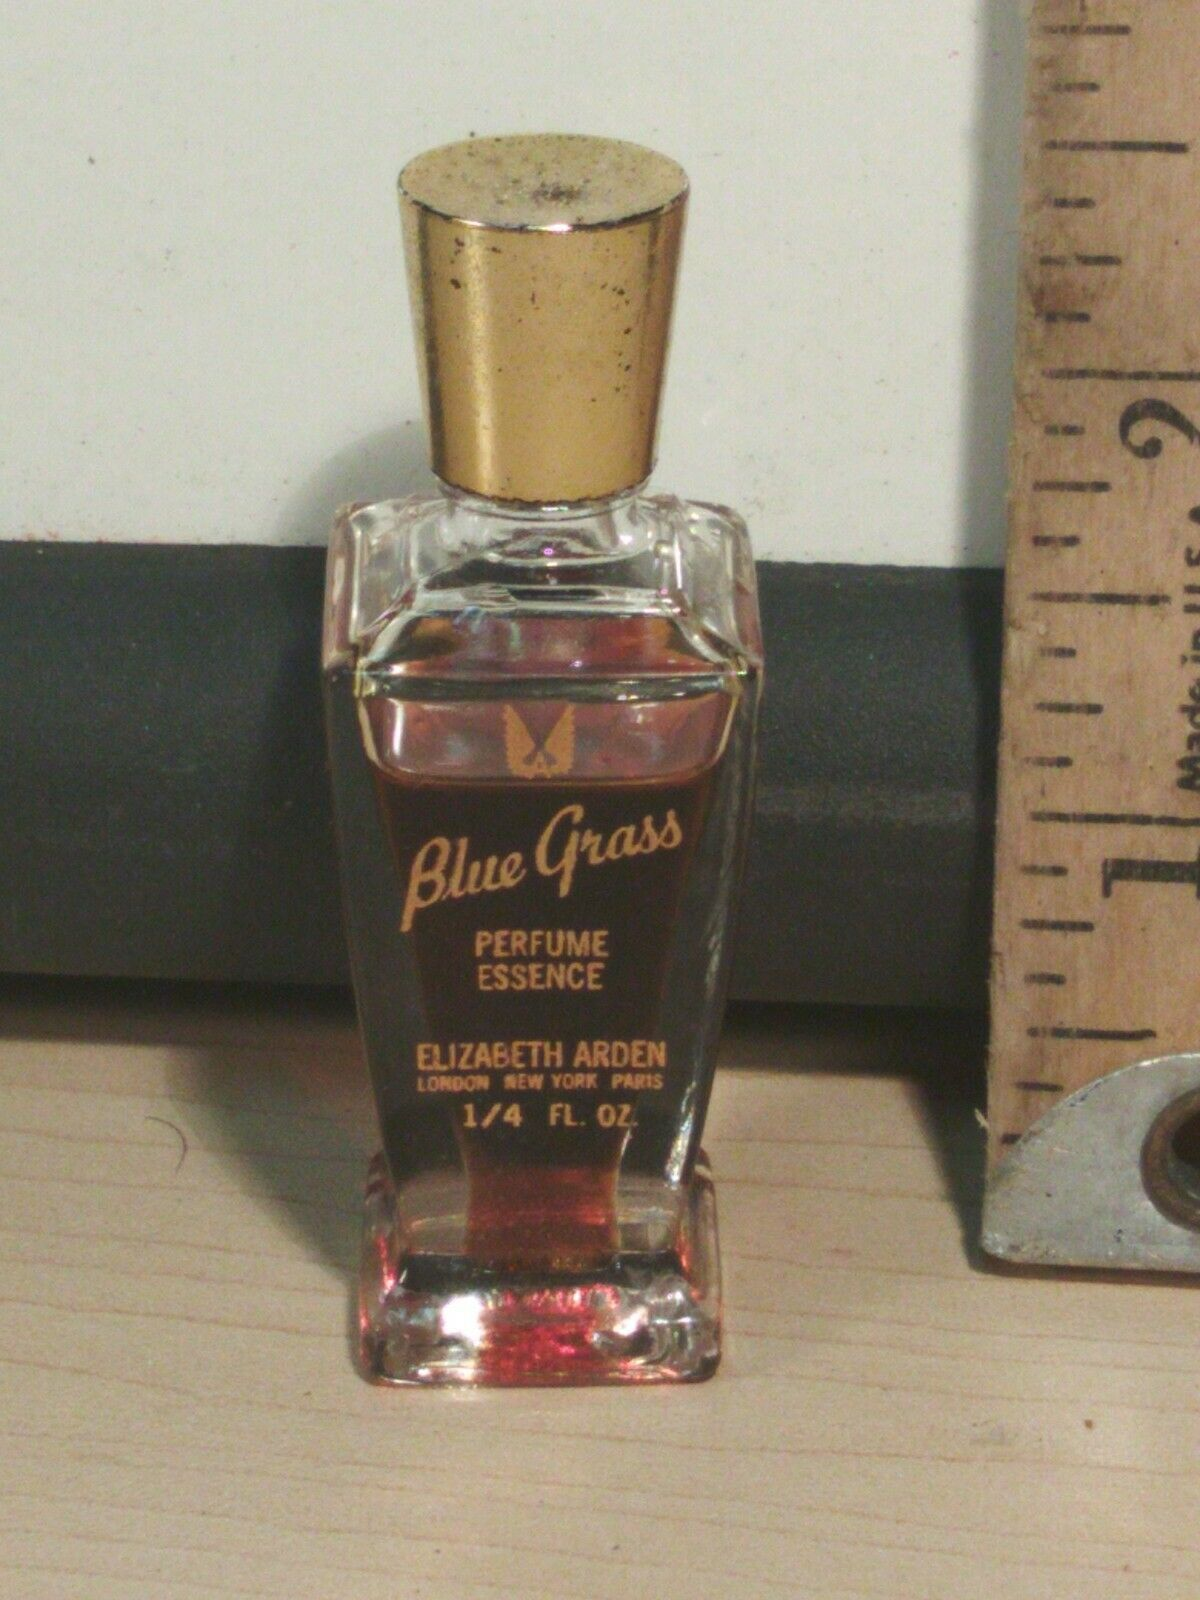 Blue Grass Perfume Essence 85% of 1/4 oz Elizabeth Arden No Box